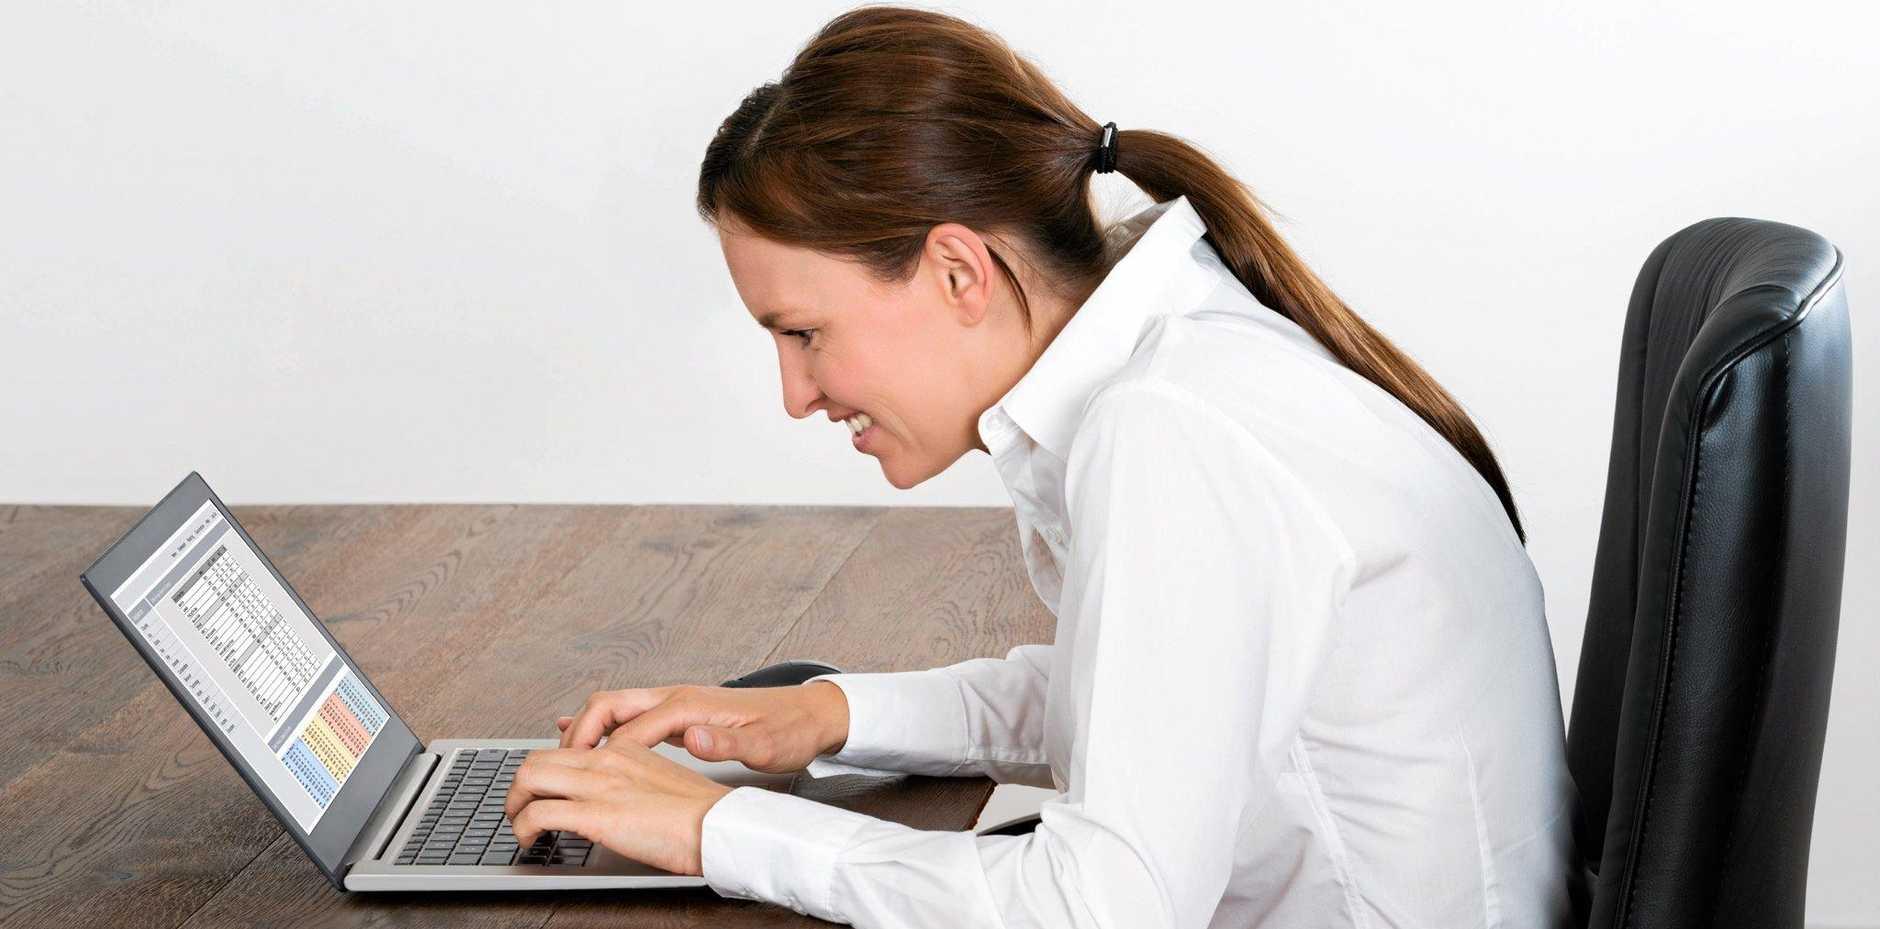 Happy Businesswoman Working On Laptop